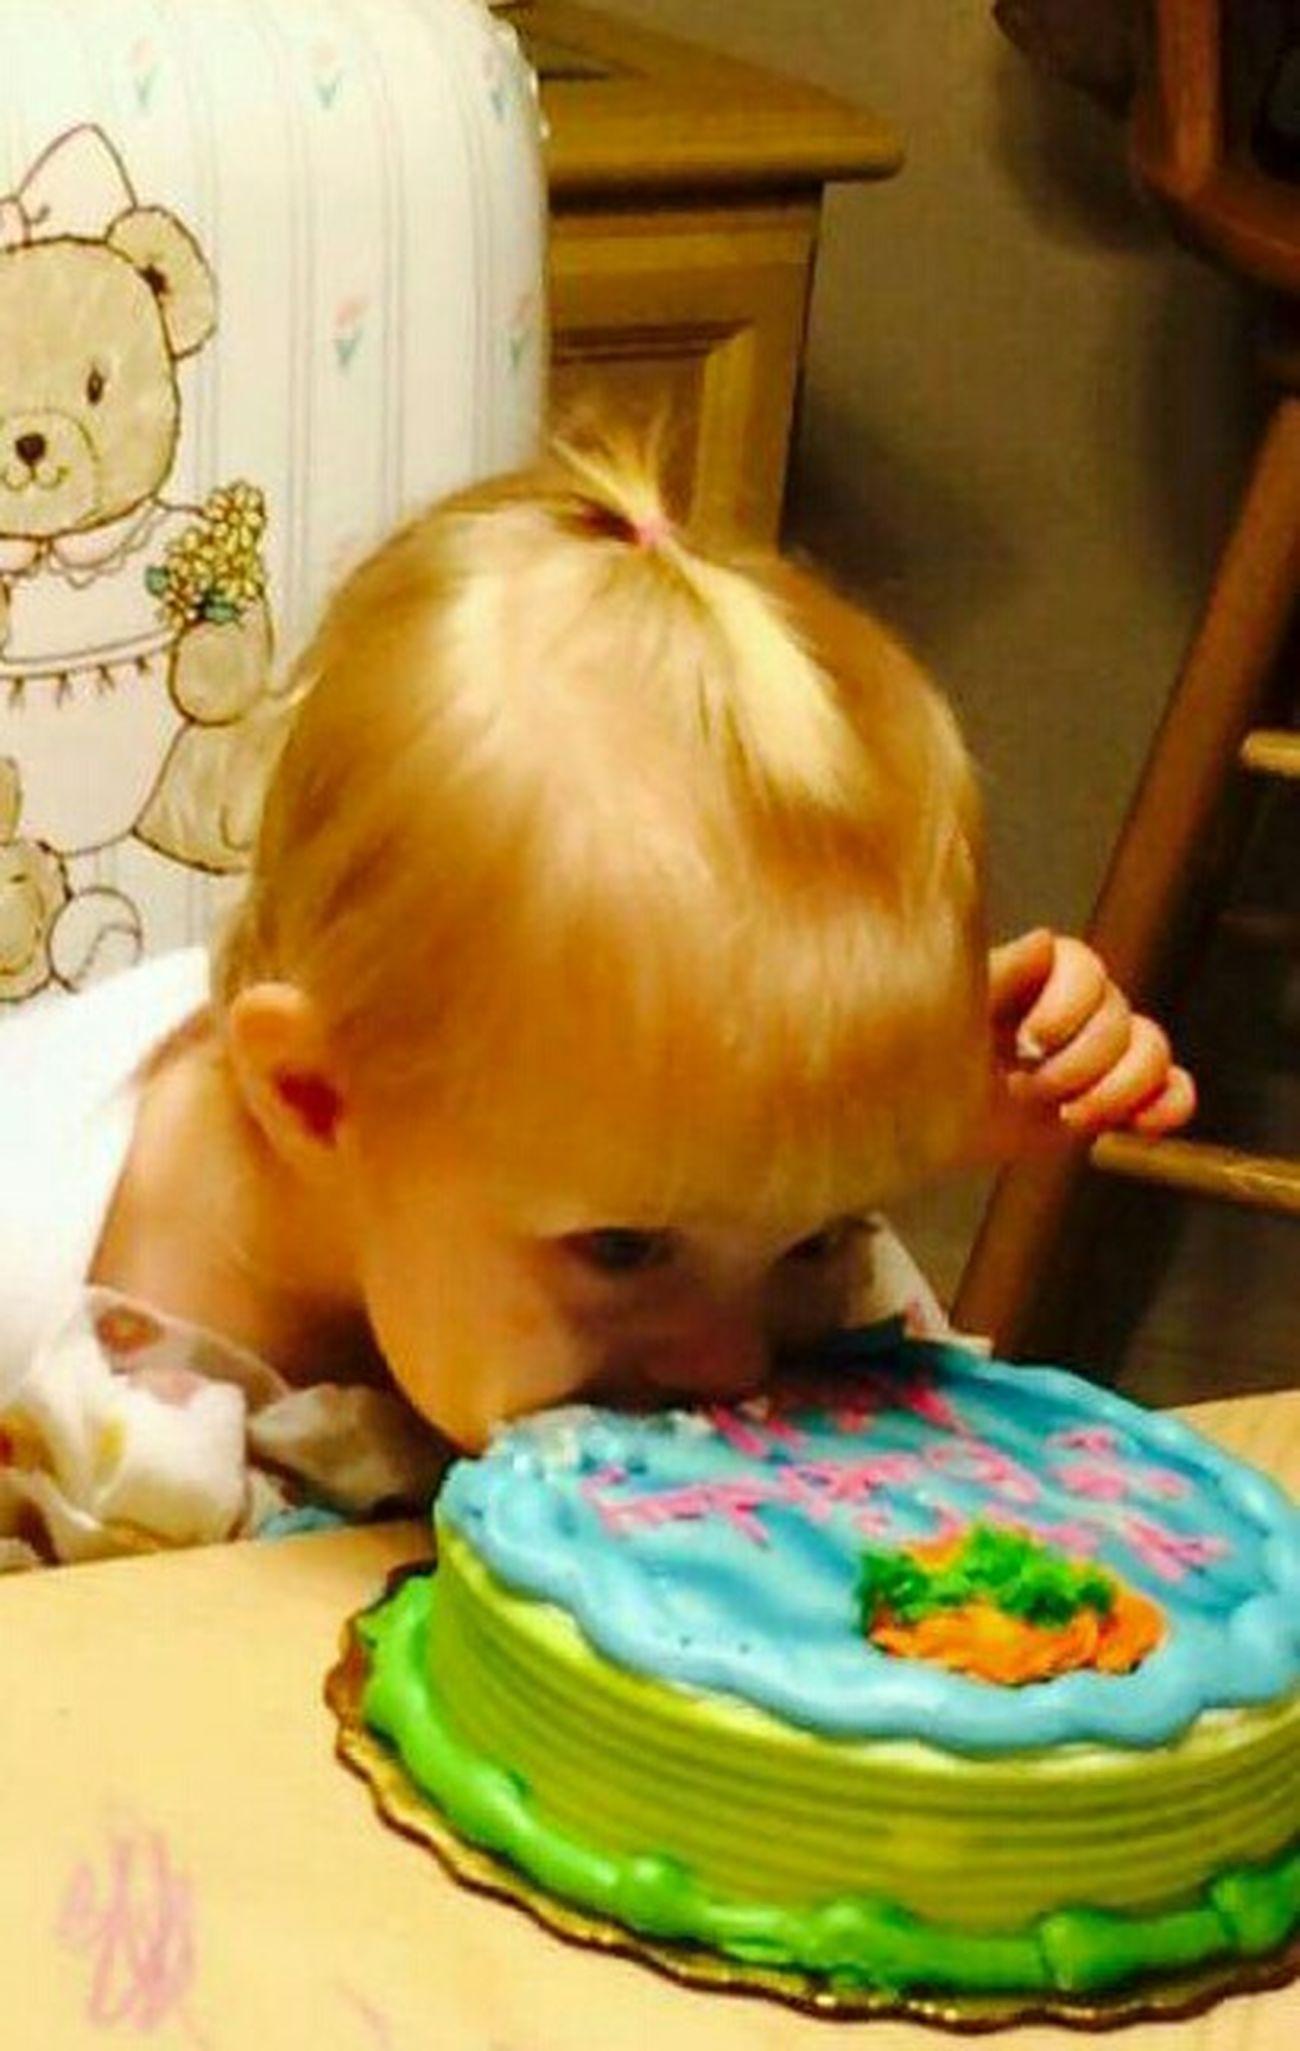 She really loves her birthday cake! Happy First Birthday!